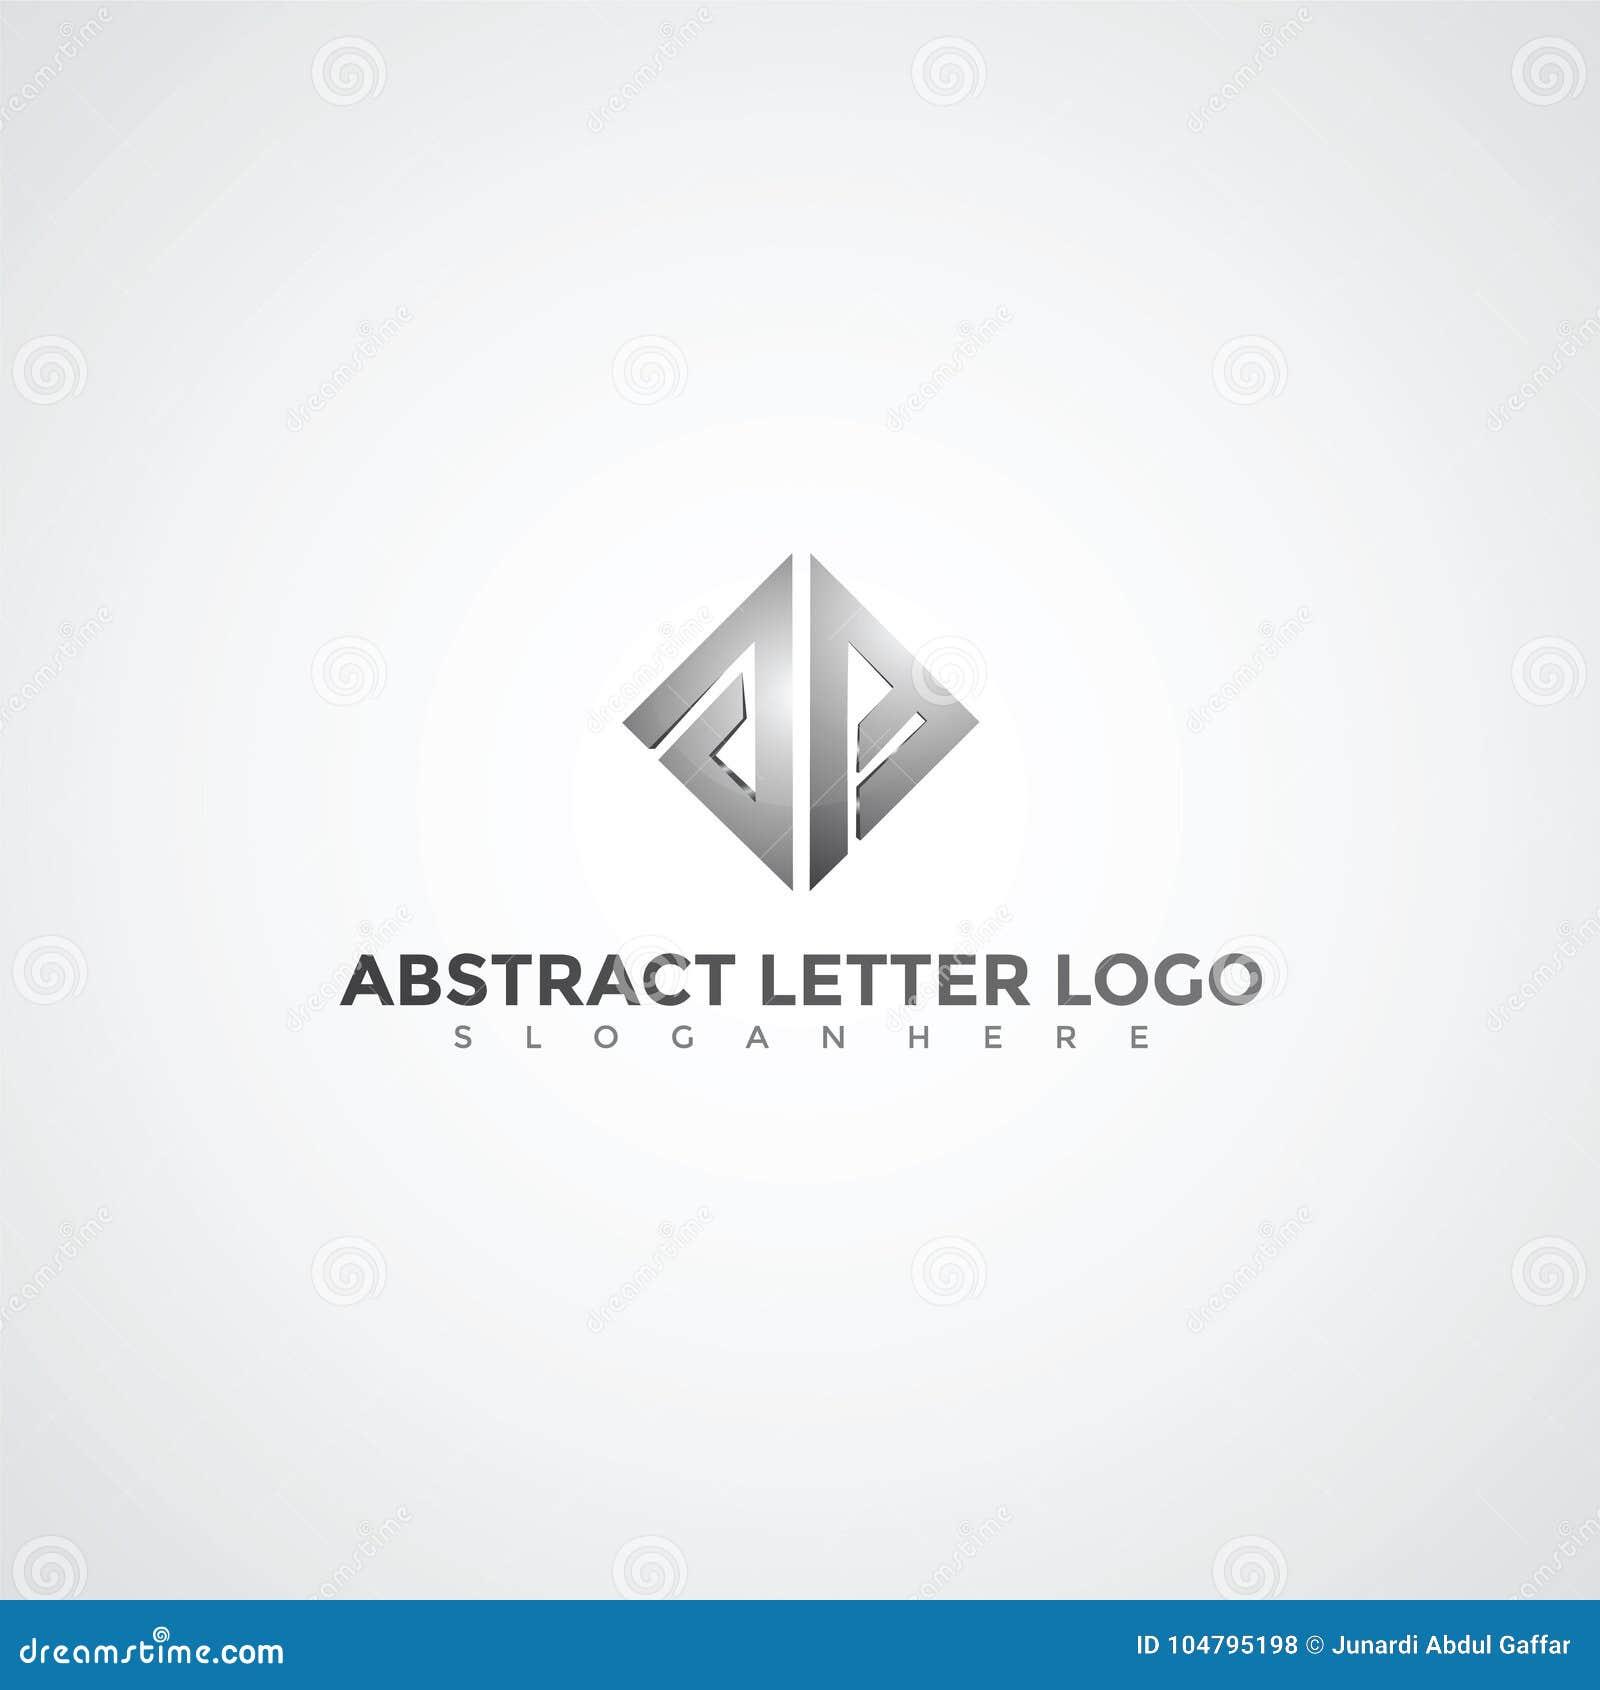 Logo Template   Abstract Letter Logo Template Vector Illustrator Eps 10 Stock